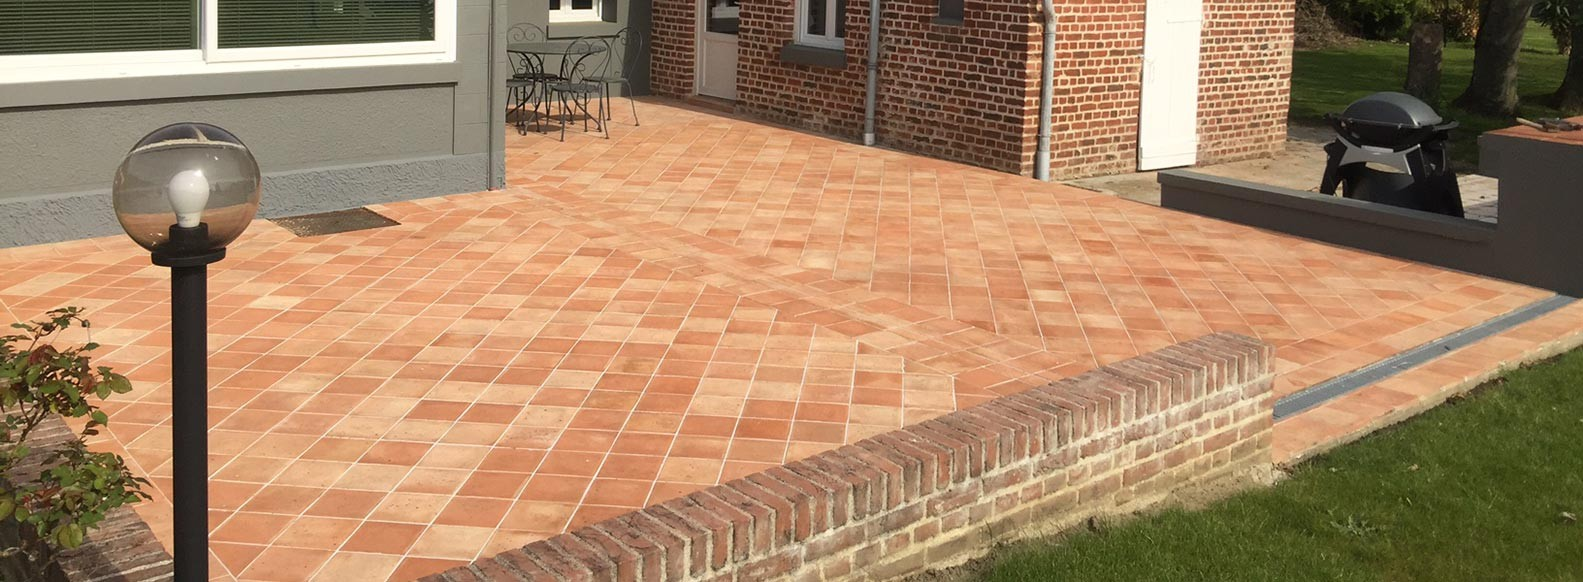 terracotta floor tile for outdoor